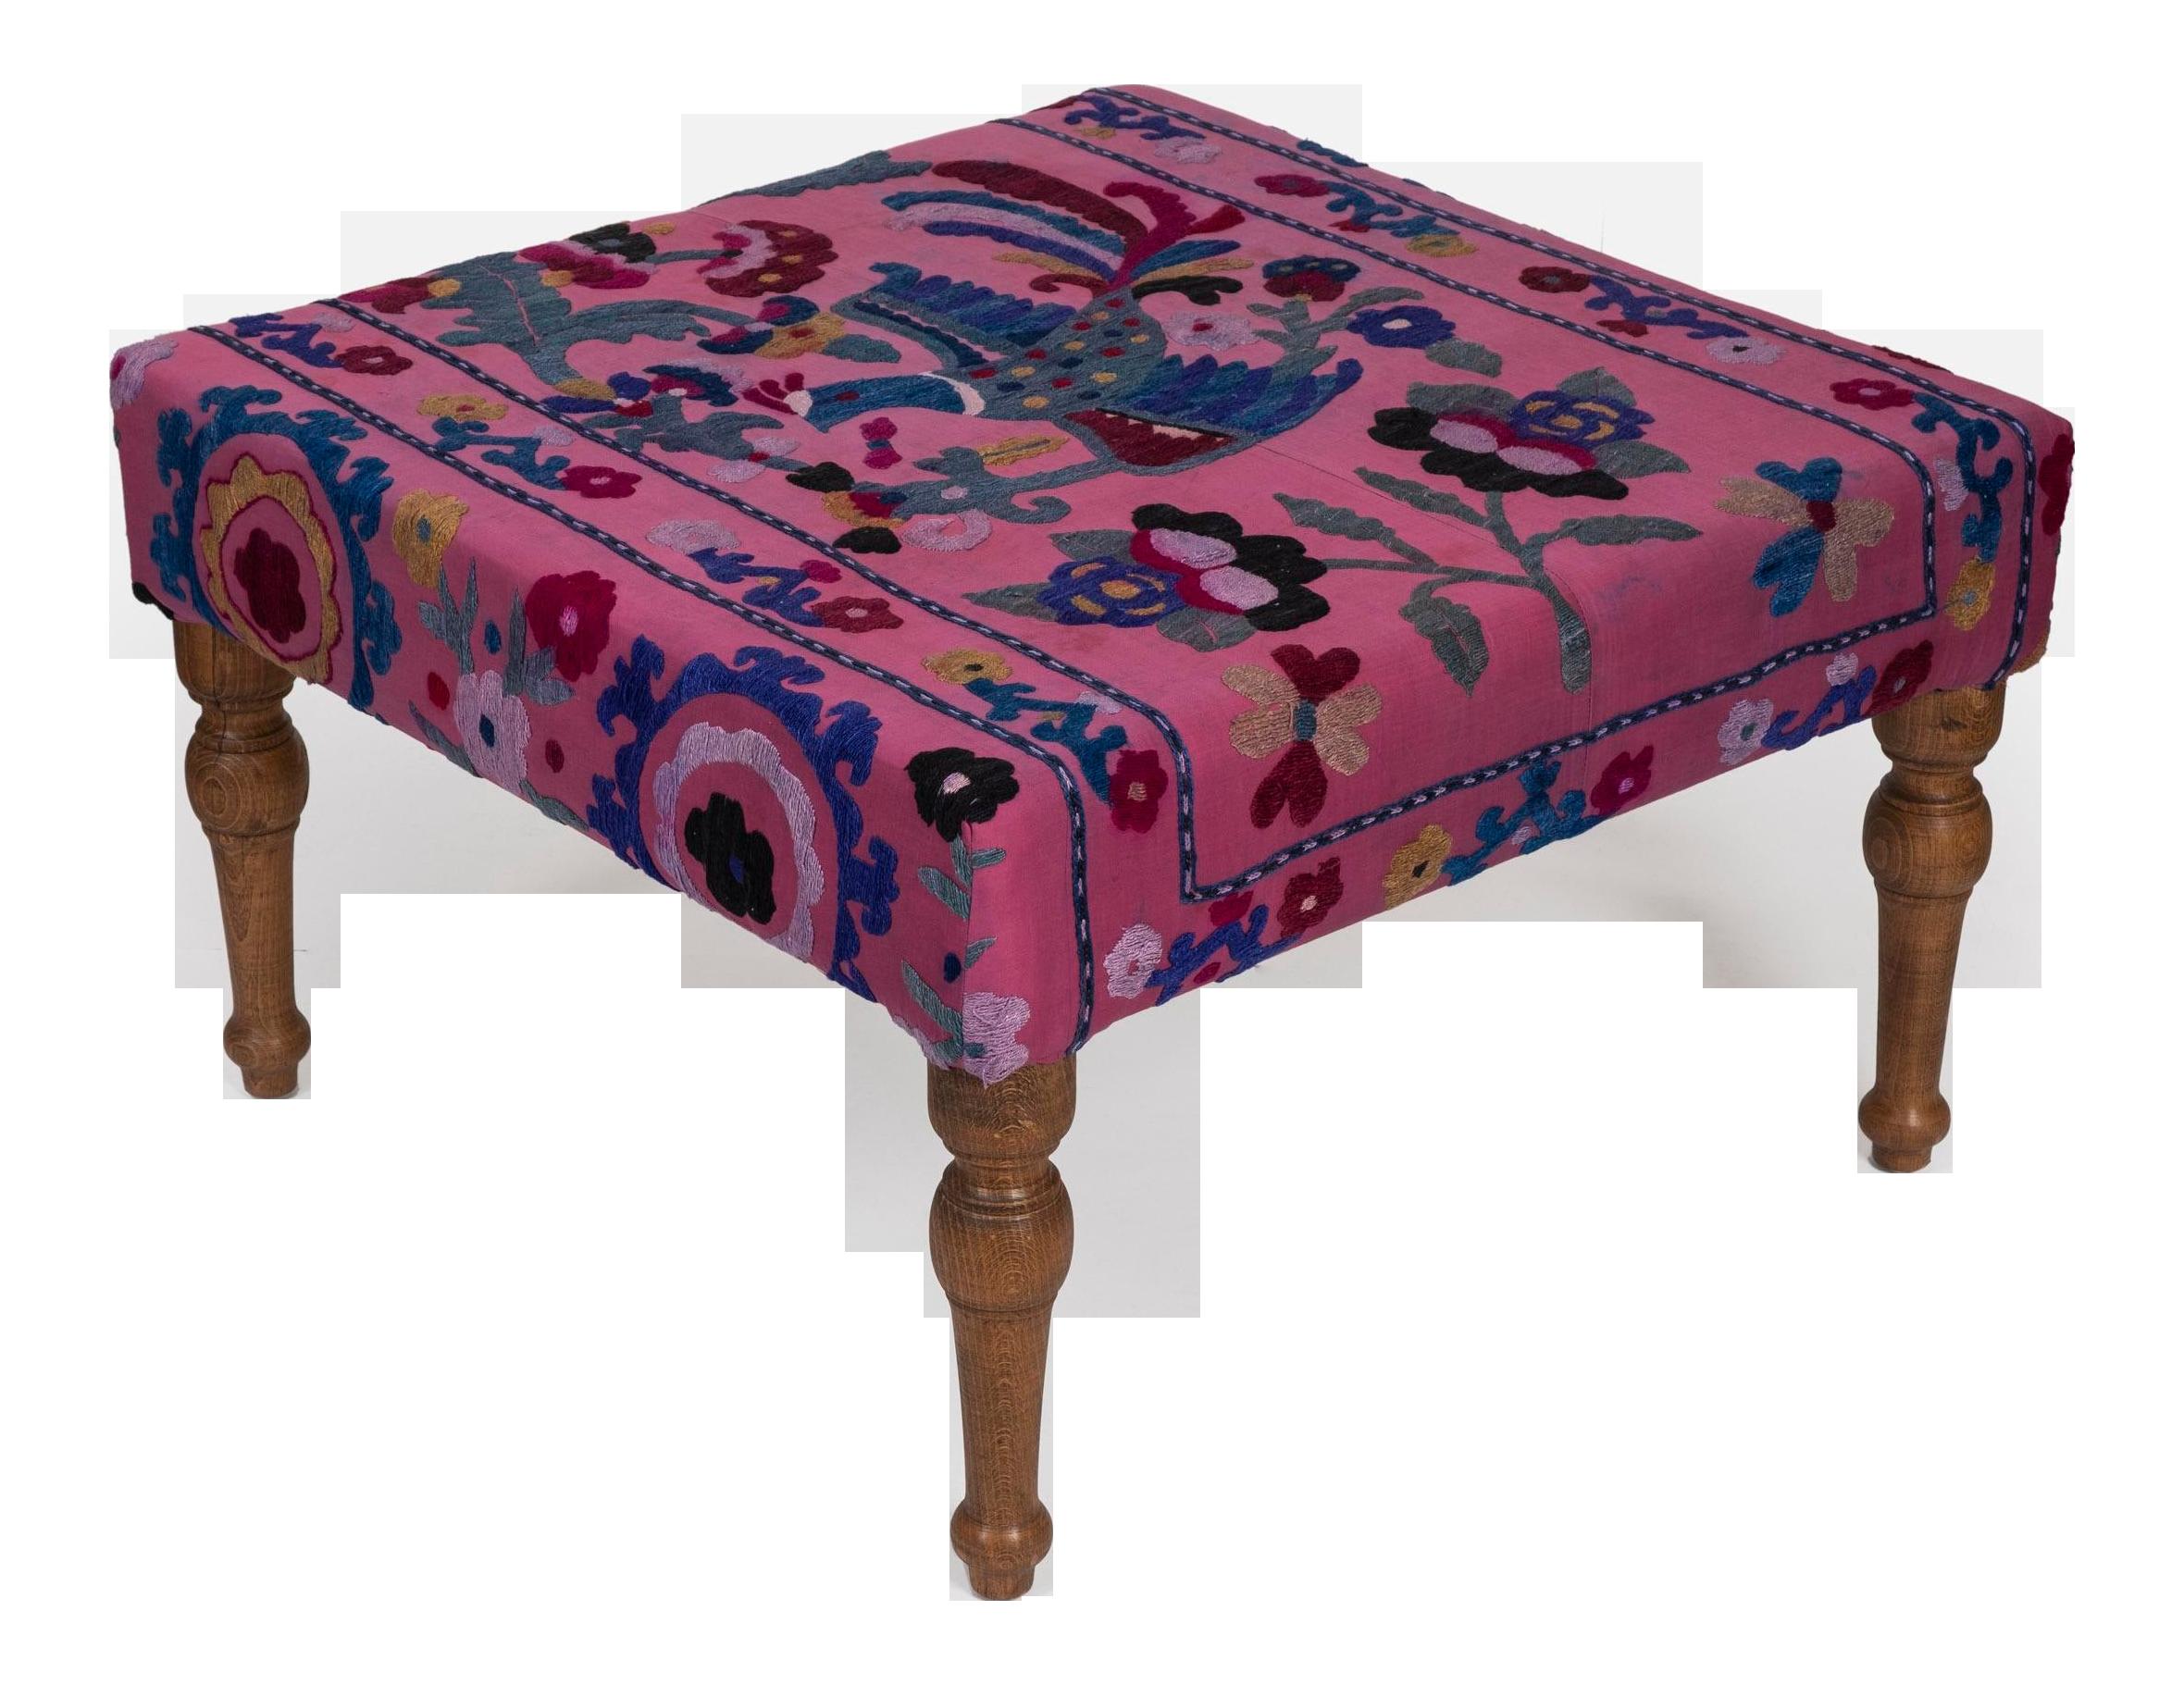 suzani square ottoman coffee table with bird motifs